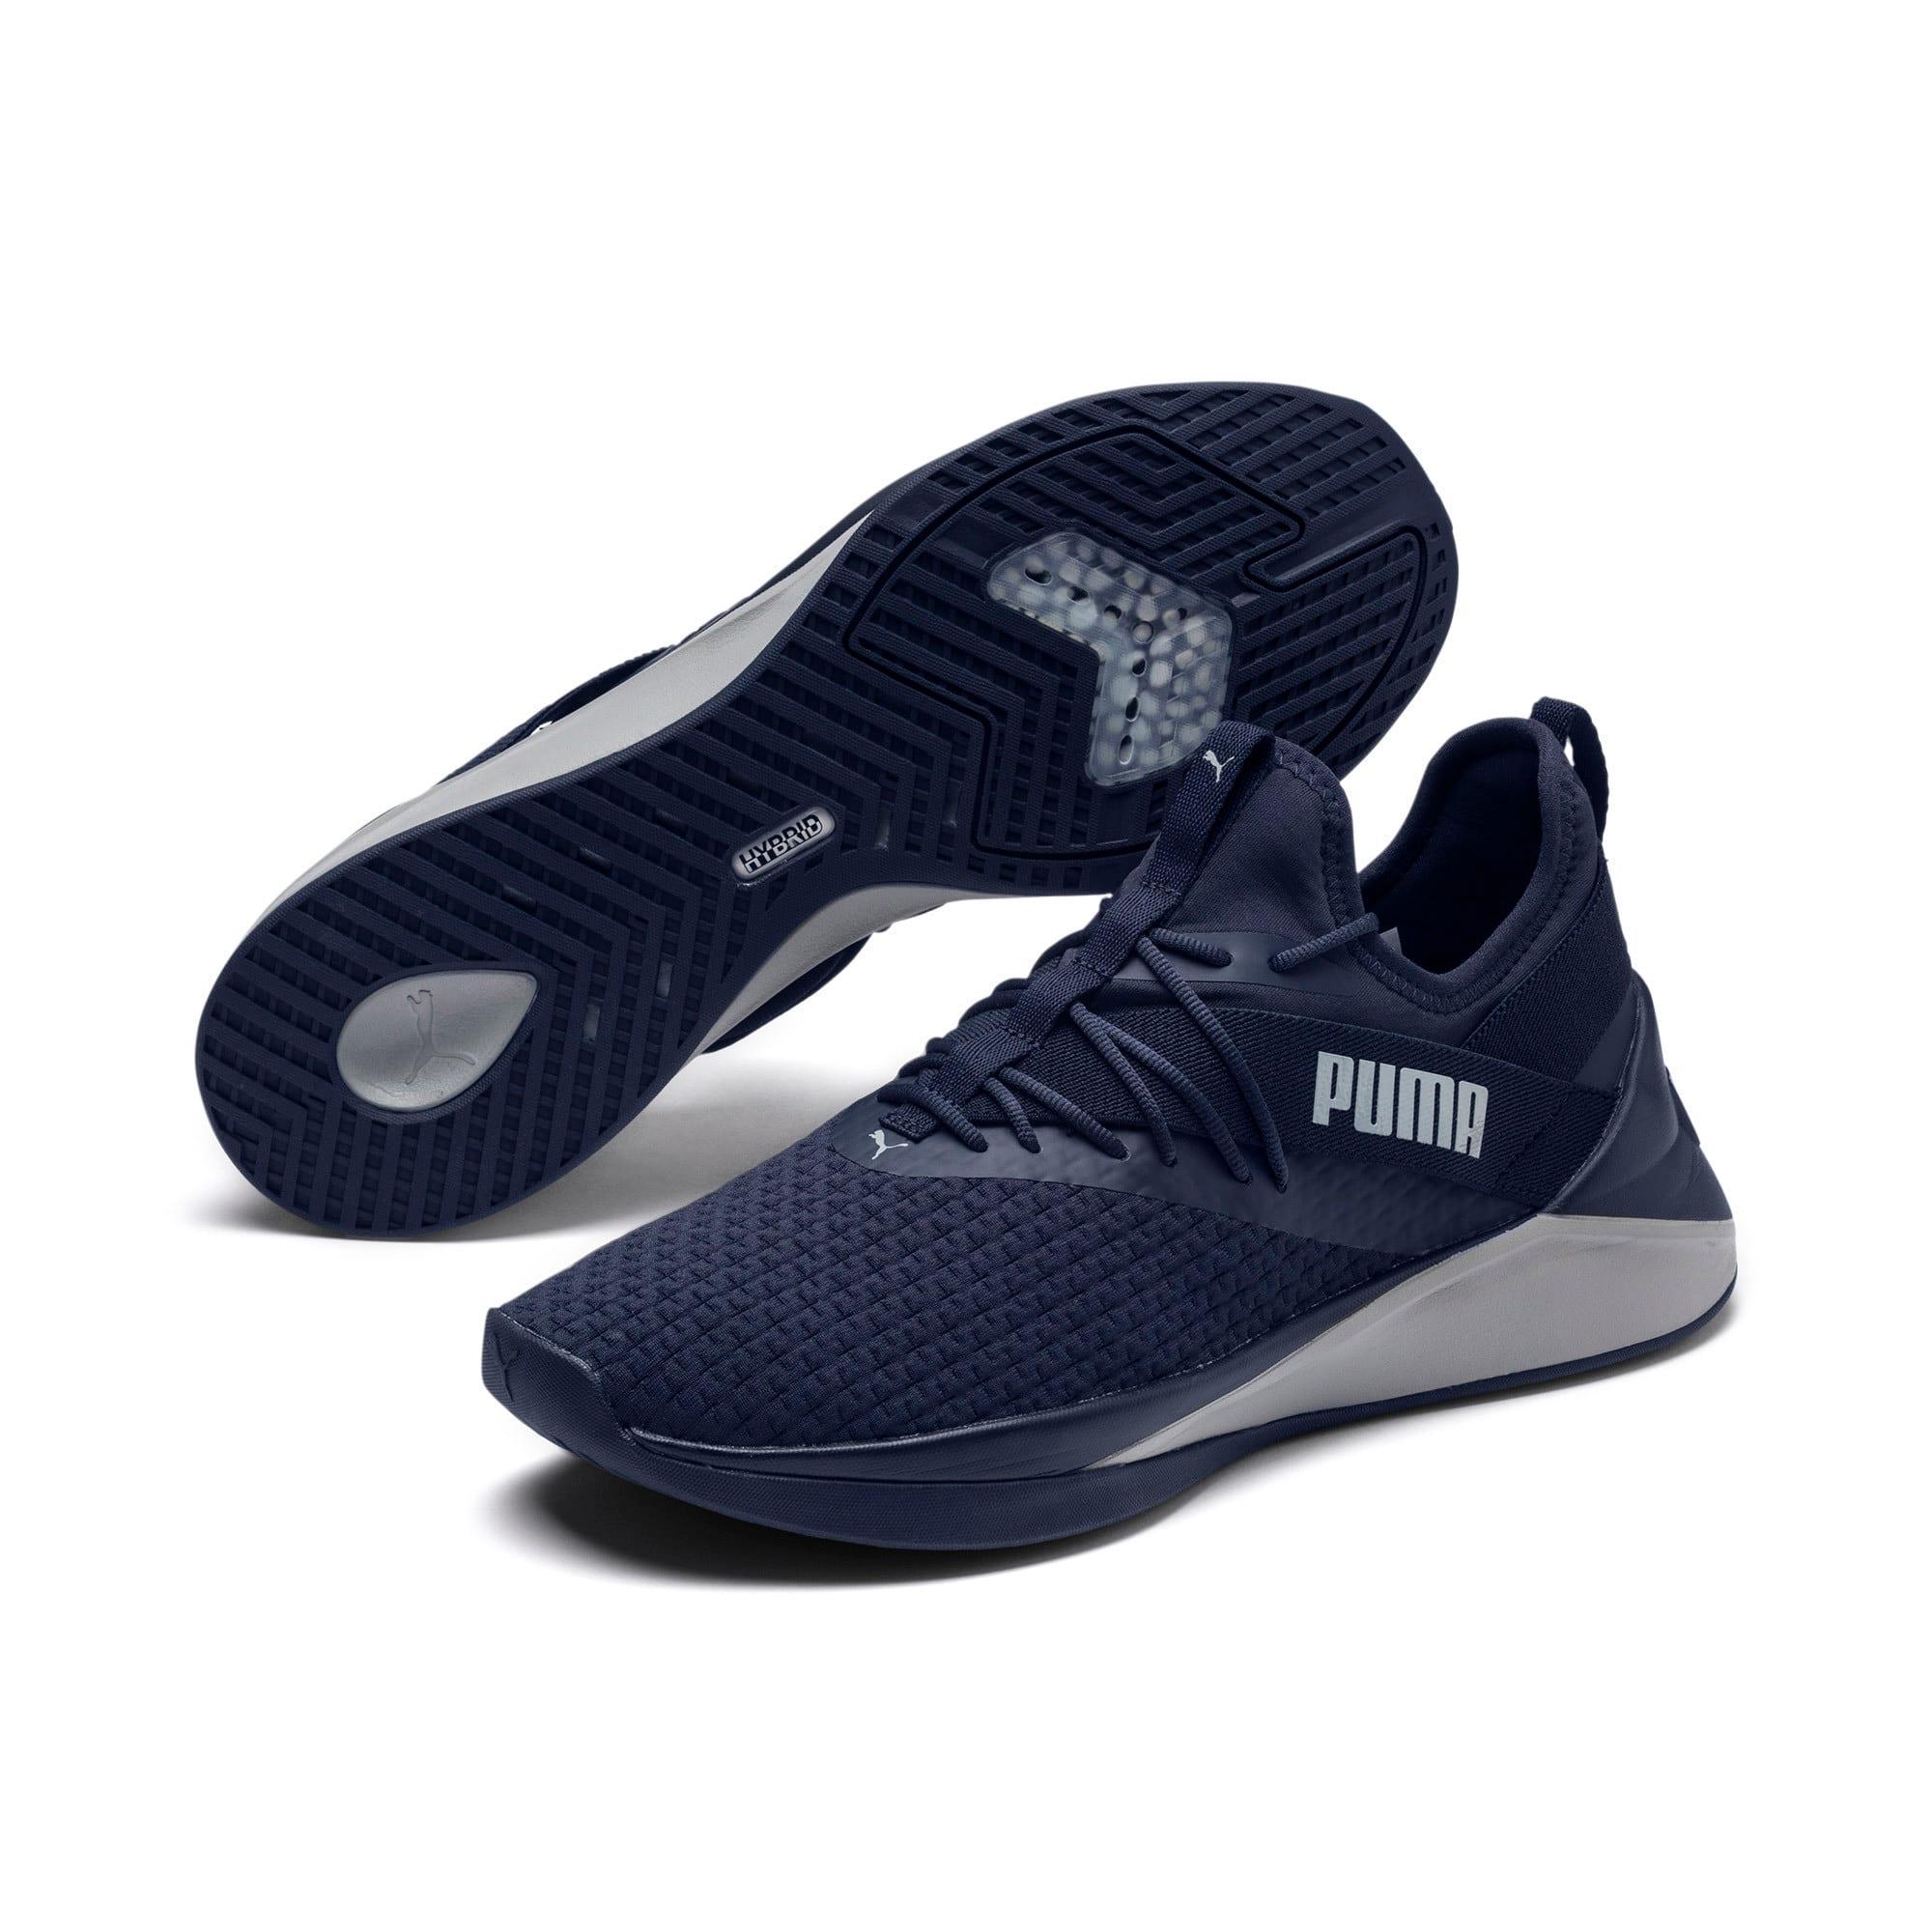 Thumbnail 2 of Jaab XT Men's Training Shoes, Peacoat-Quarry, medium